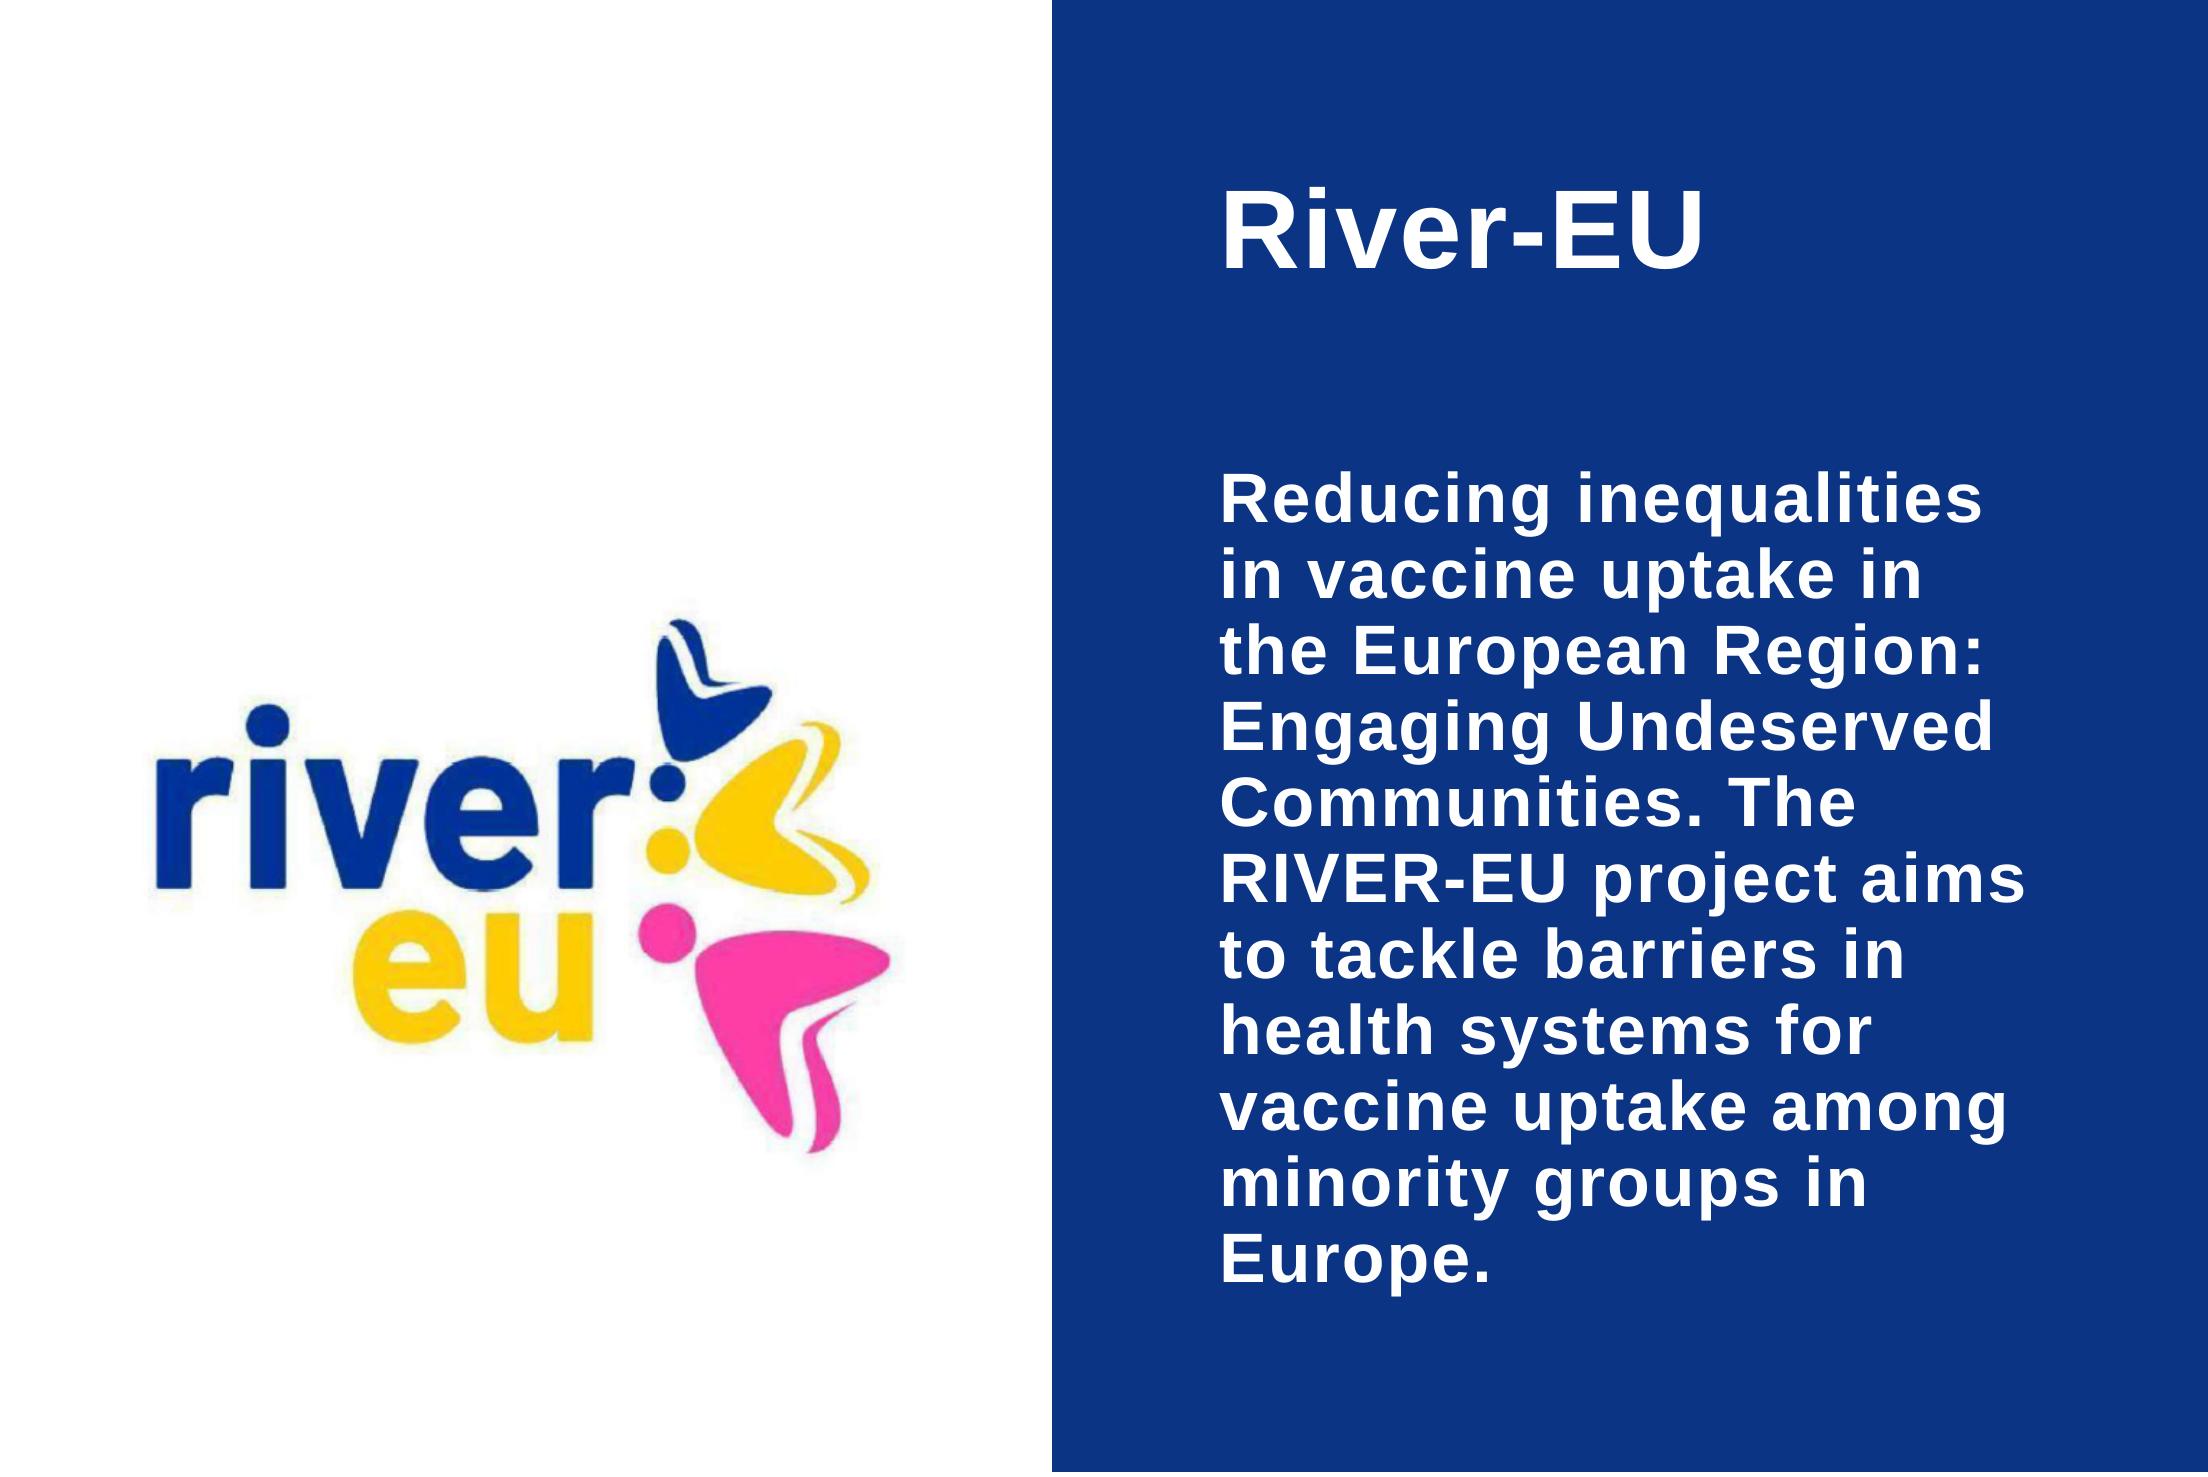 RIVER-EU